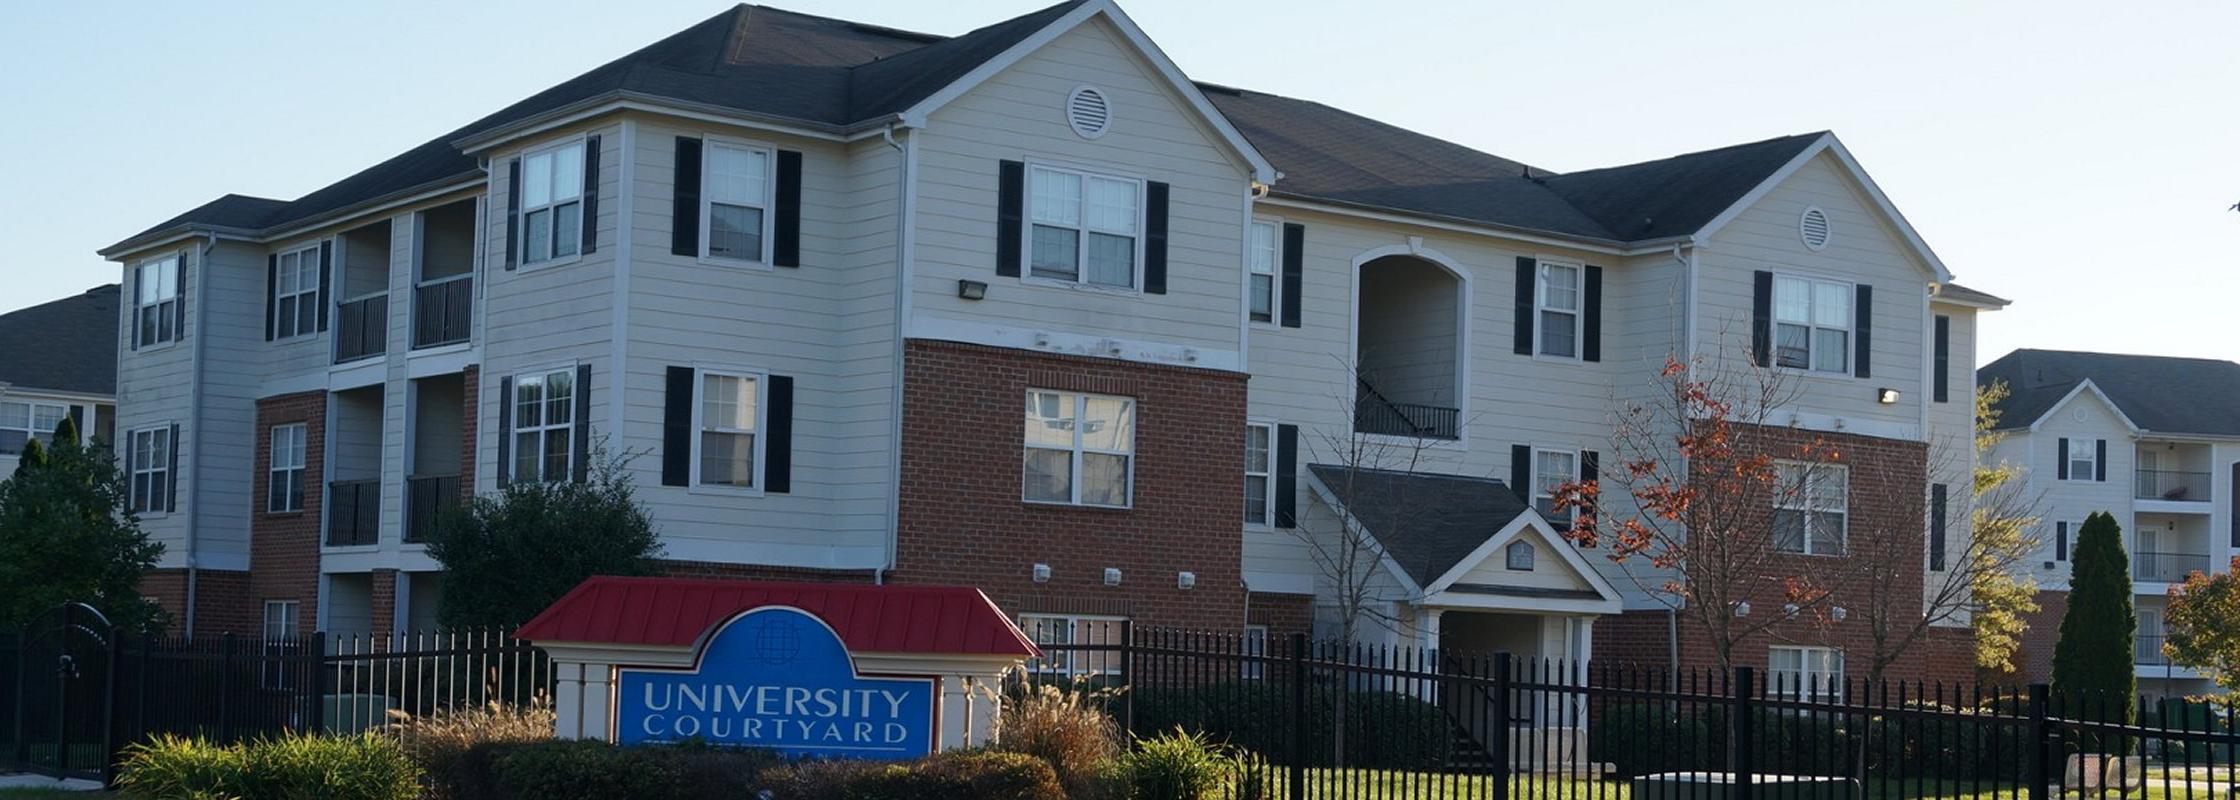 University Courtyard Apartments